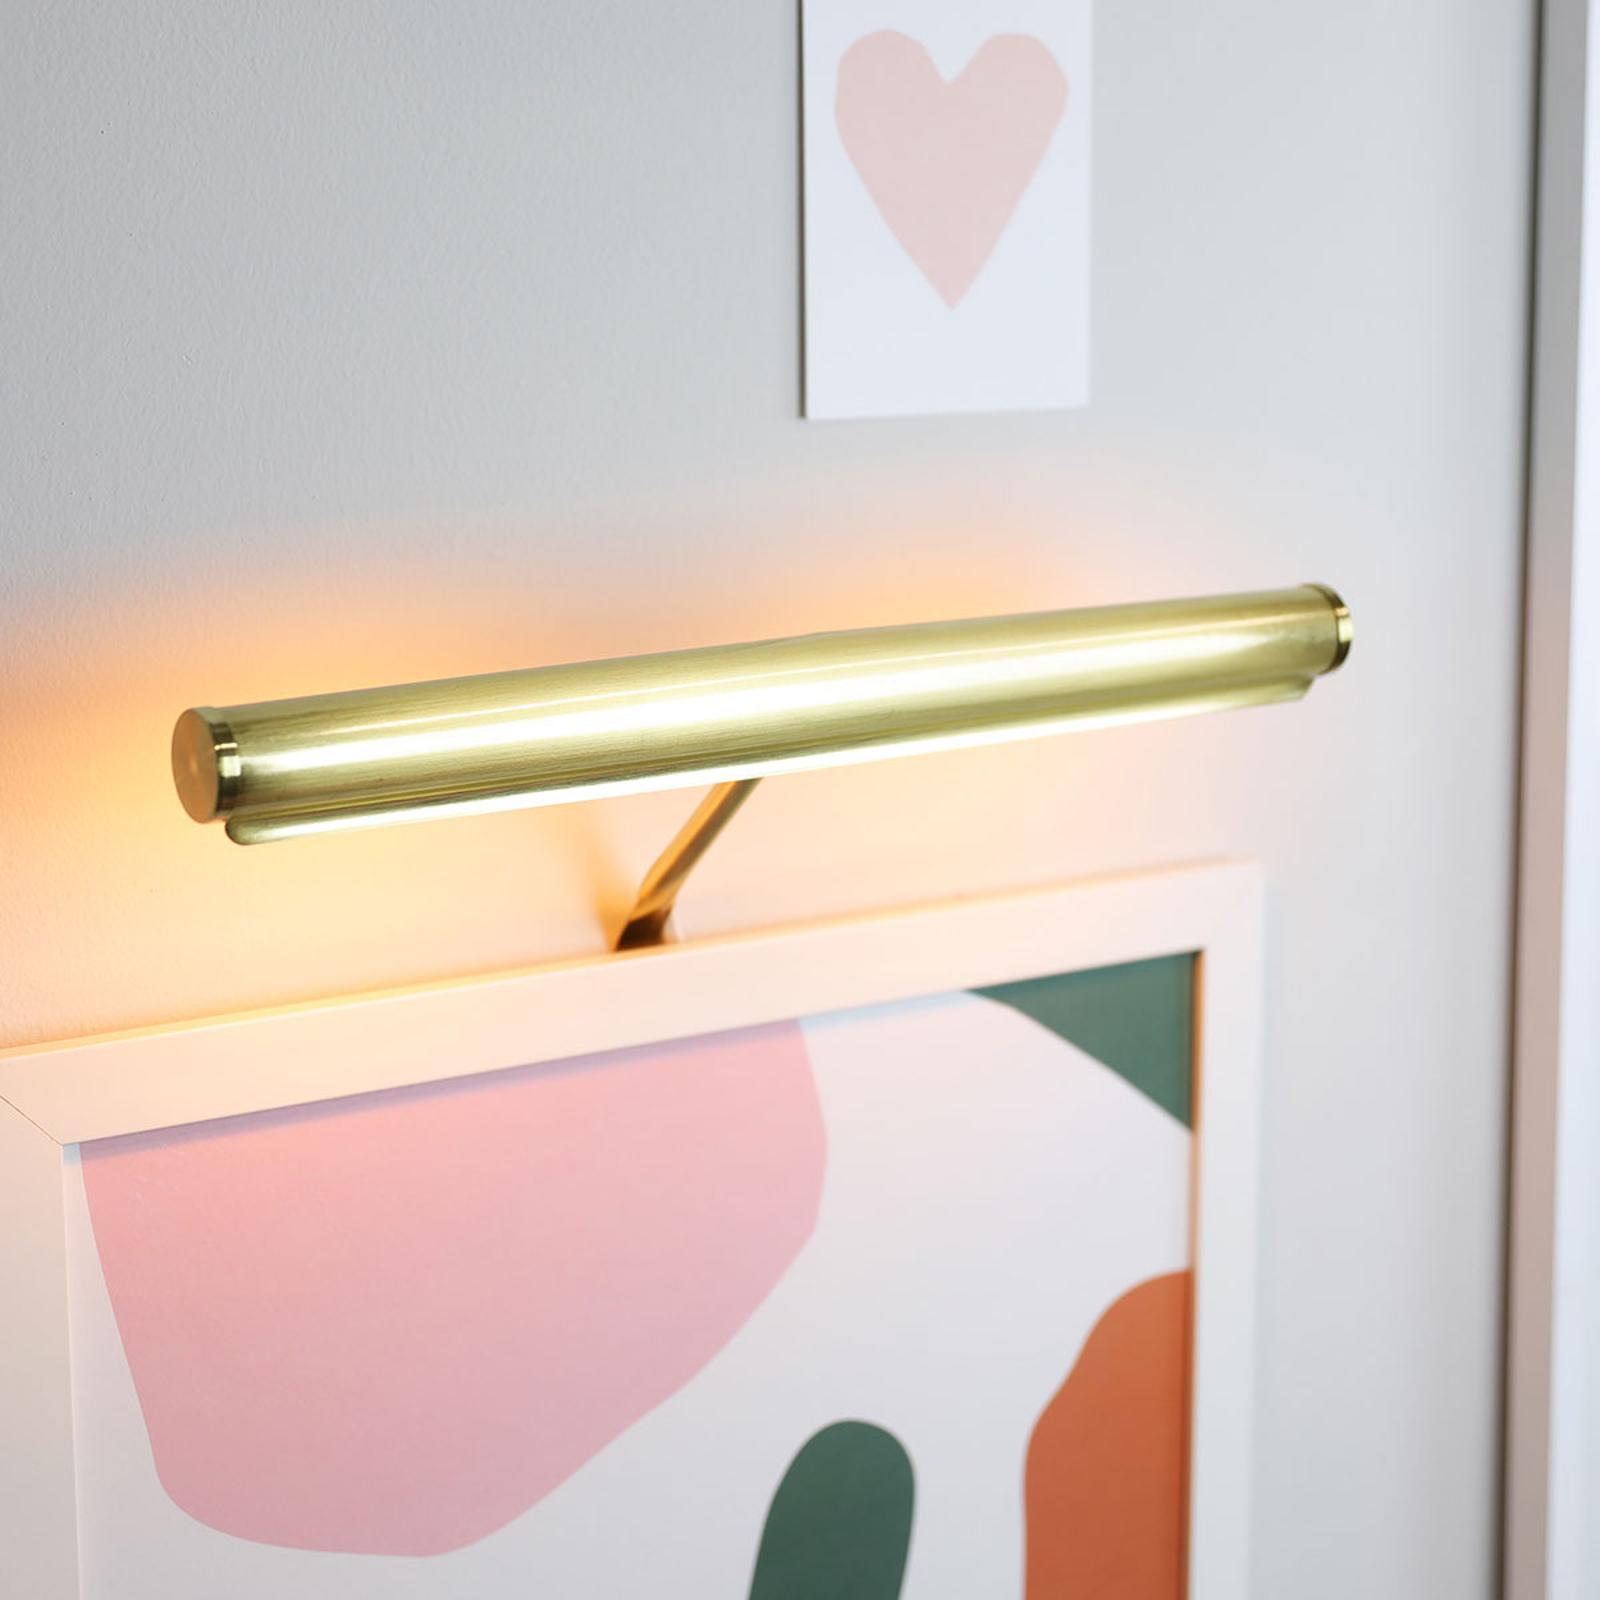 Lampada da quadri Mona-Lisa, larga 35 cm, ottone